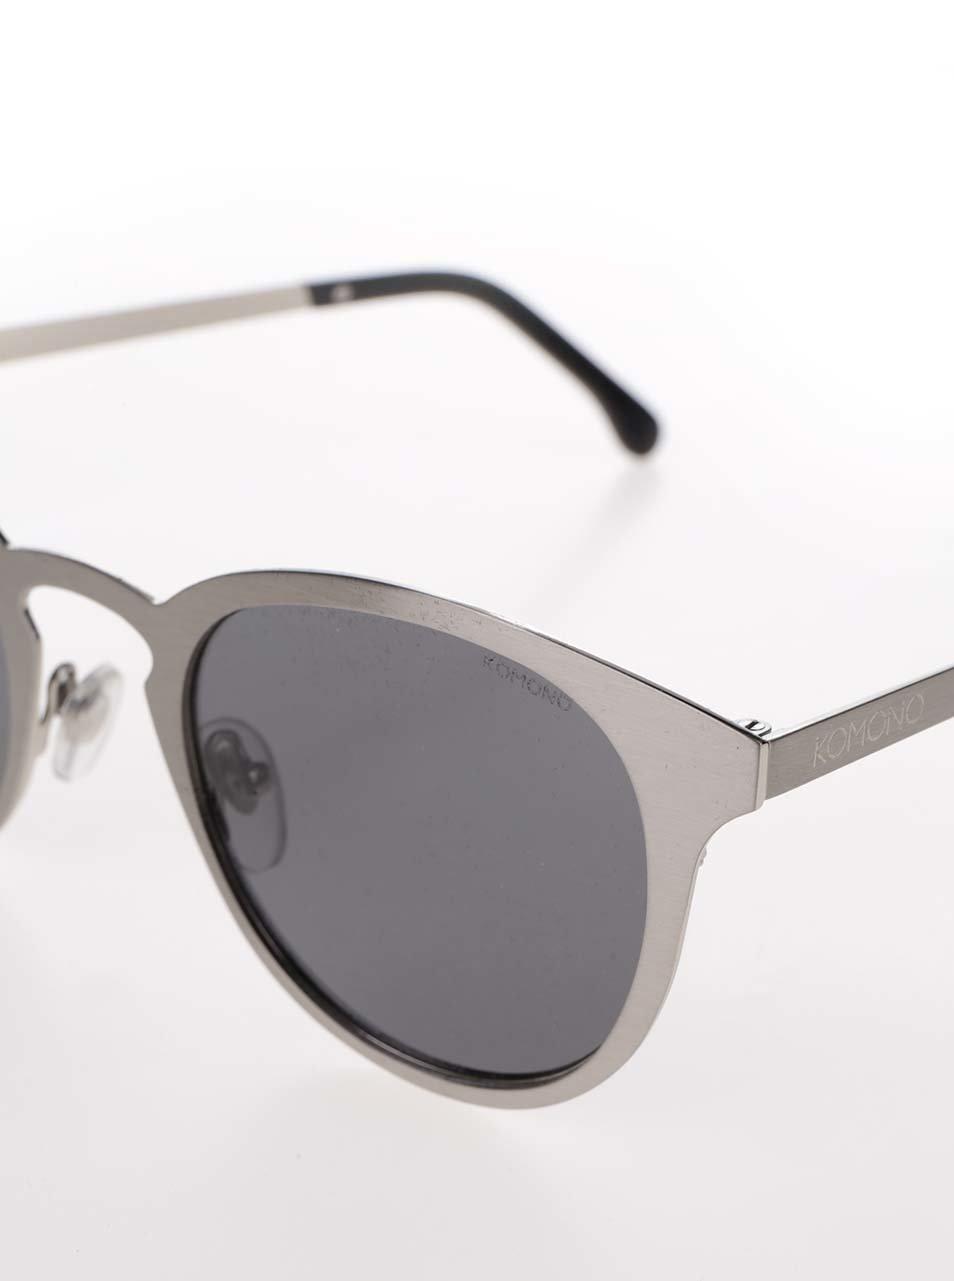 Sivé unisex slnečné okuliare s kovovým remienkom Komono Hollis ... 31ee4d89d15